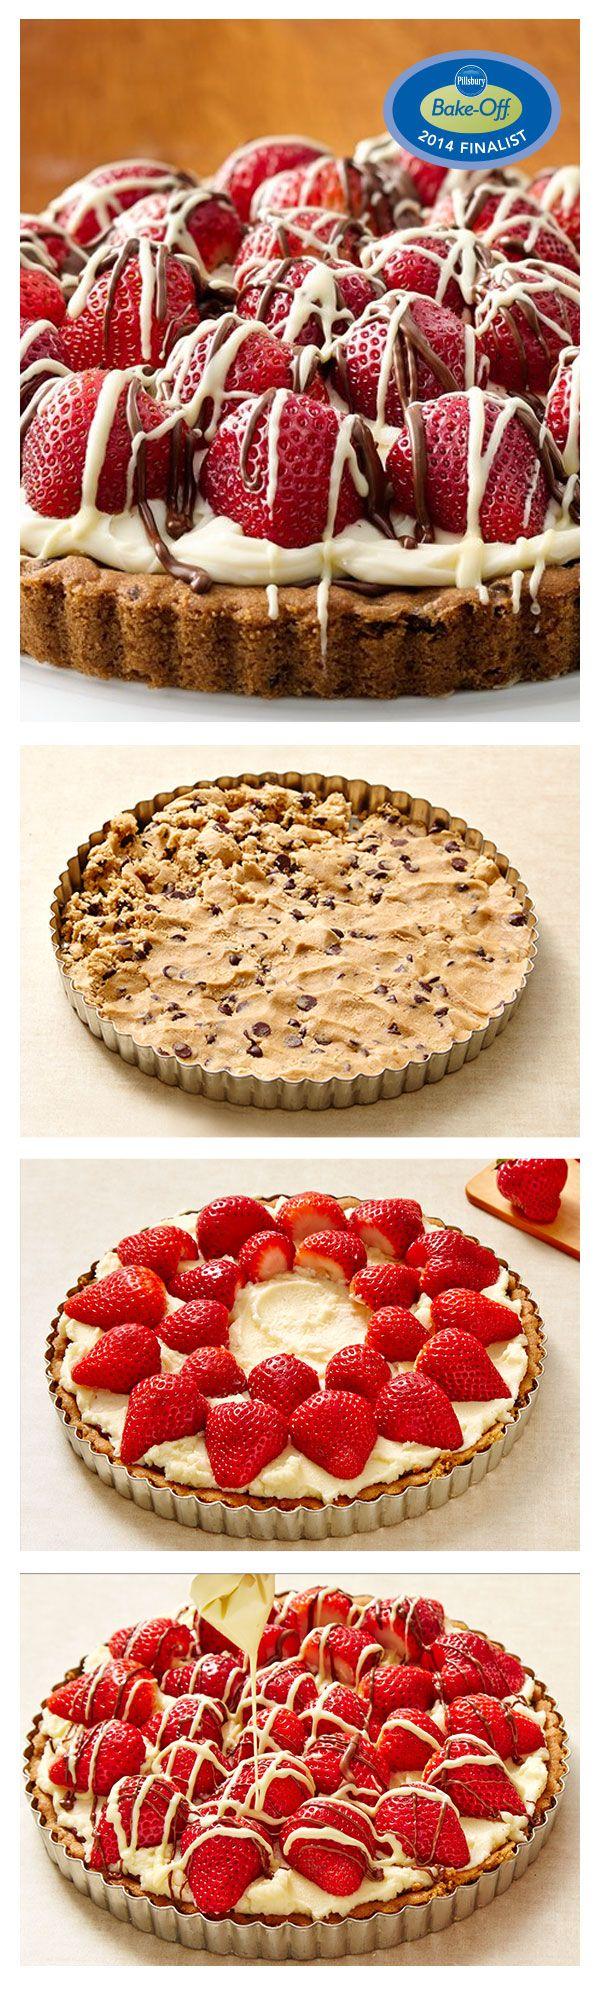 47th Bake-Off Contest Finalist: Strawberry-Mascarpone-Hazelnut Chocolate Tart by Pamela Shank from Parkersburg, WV